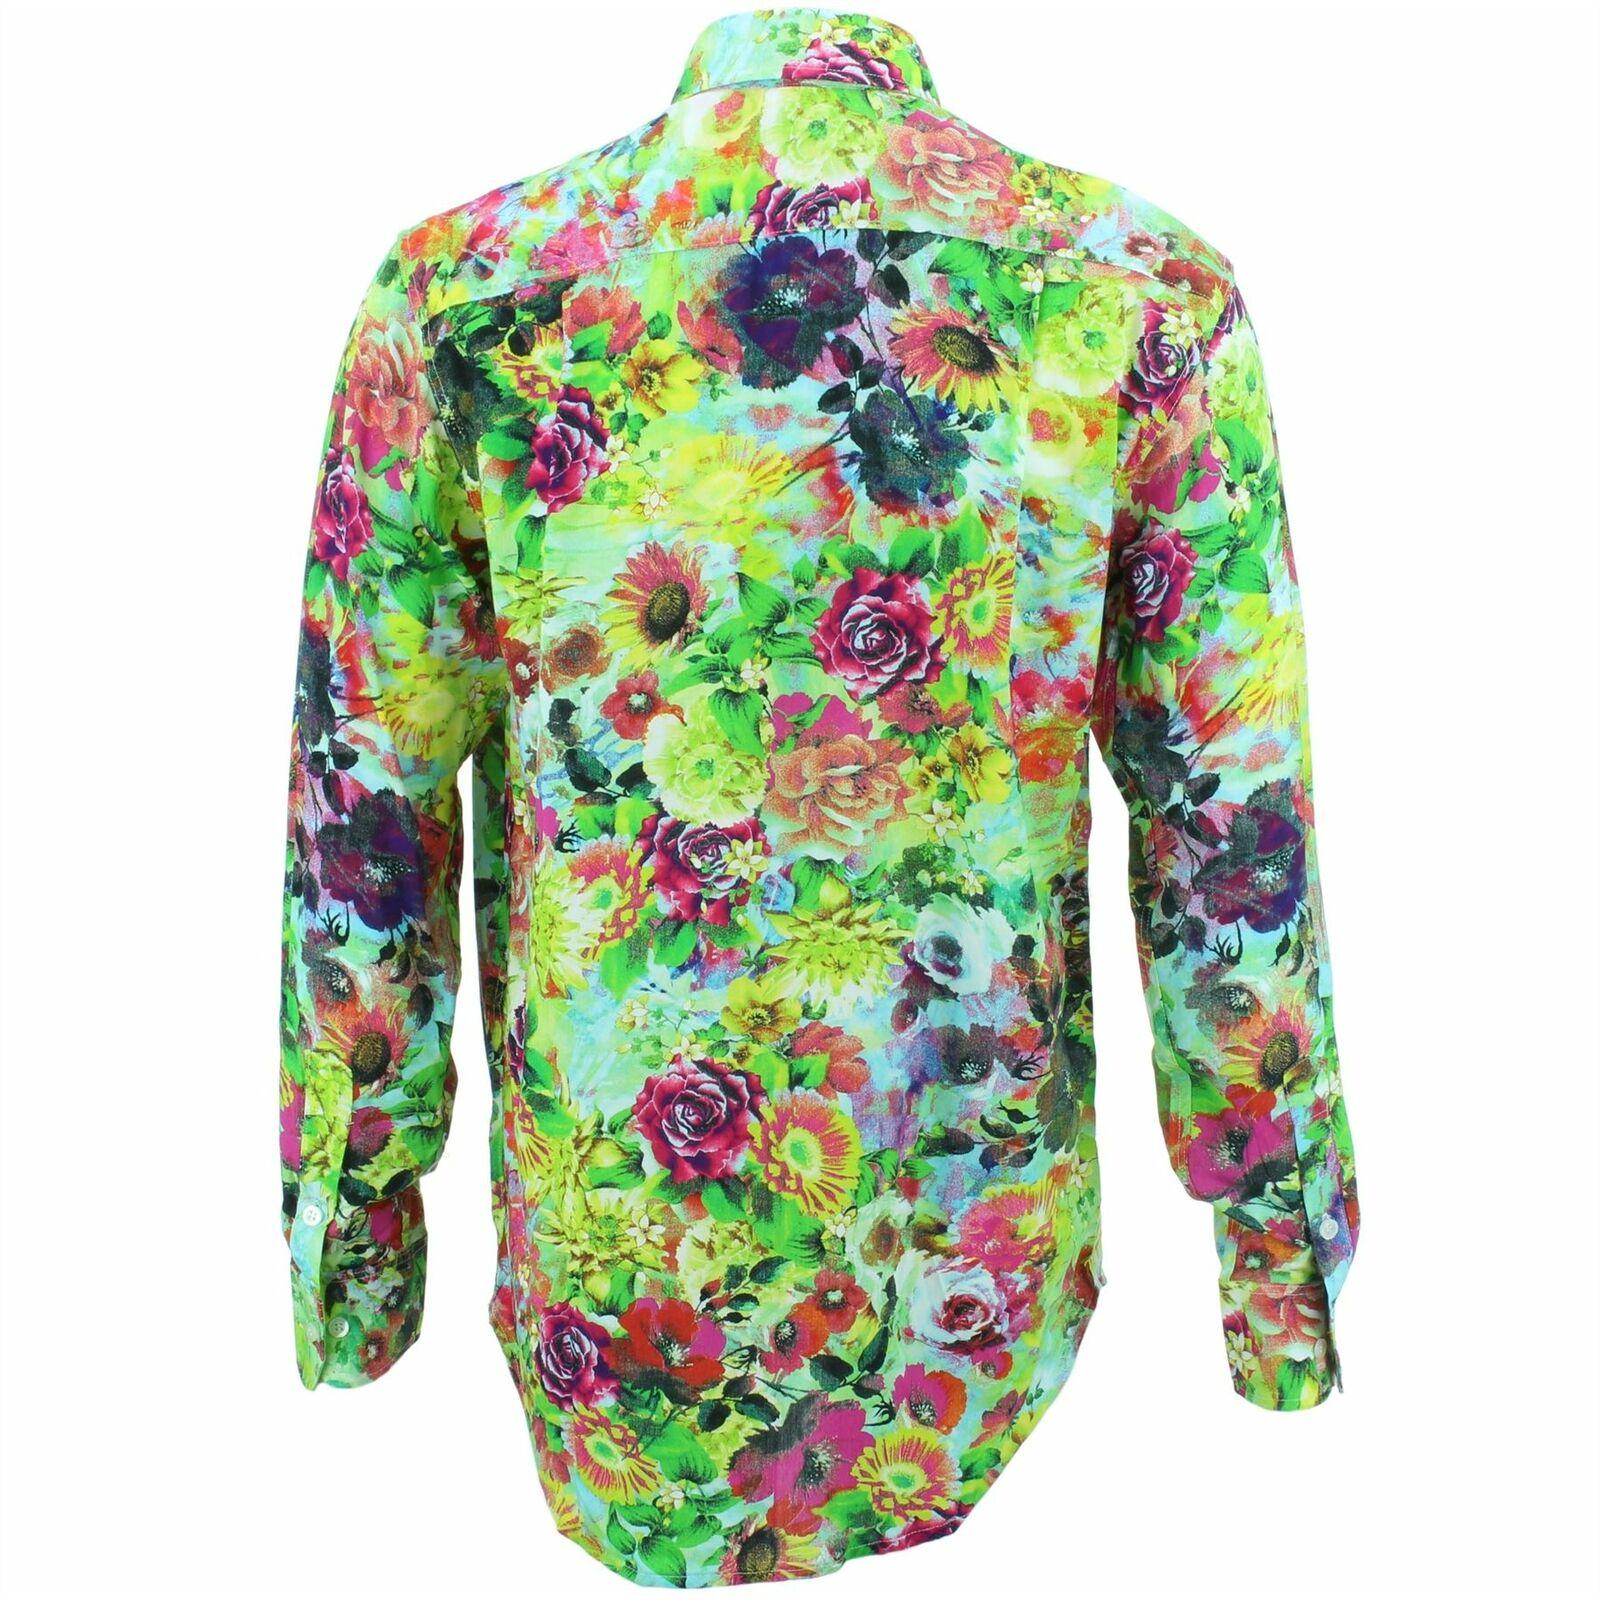 Mens Shirt Loud Originals REGULAR FIT FIT FIT Floral Grün Retro Psychedelic Fancy  | Sonderpreis  24aec0